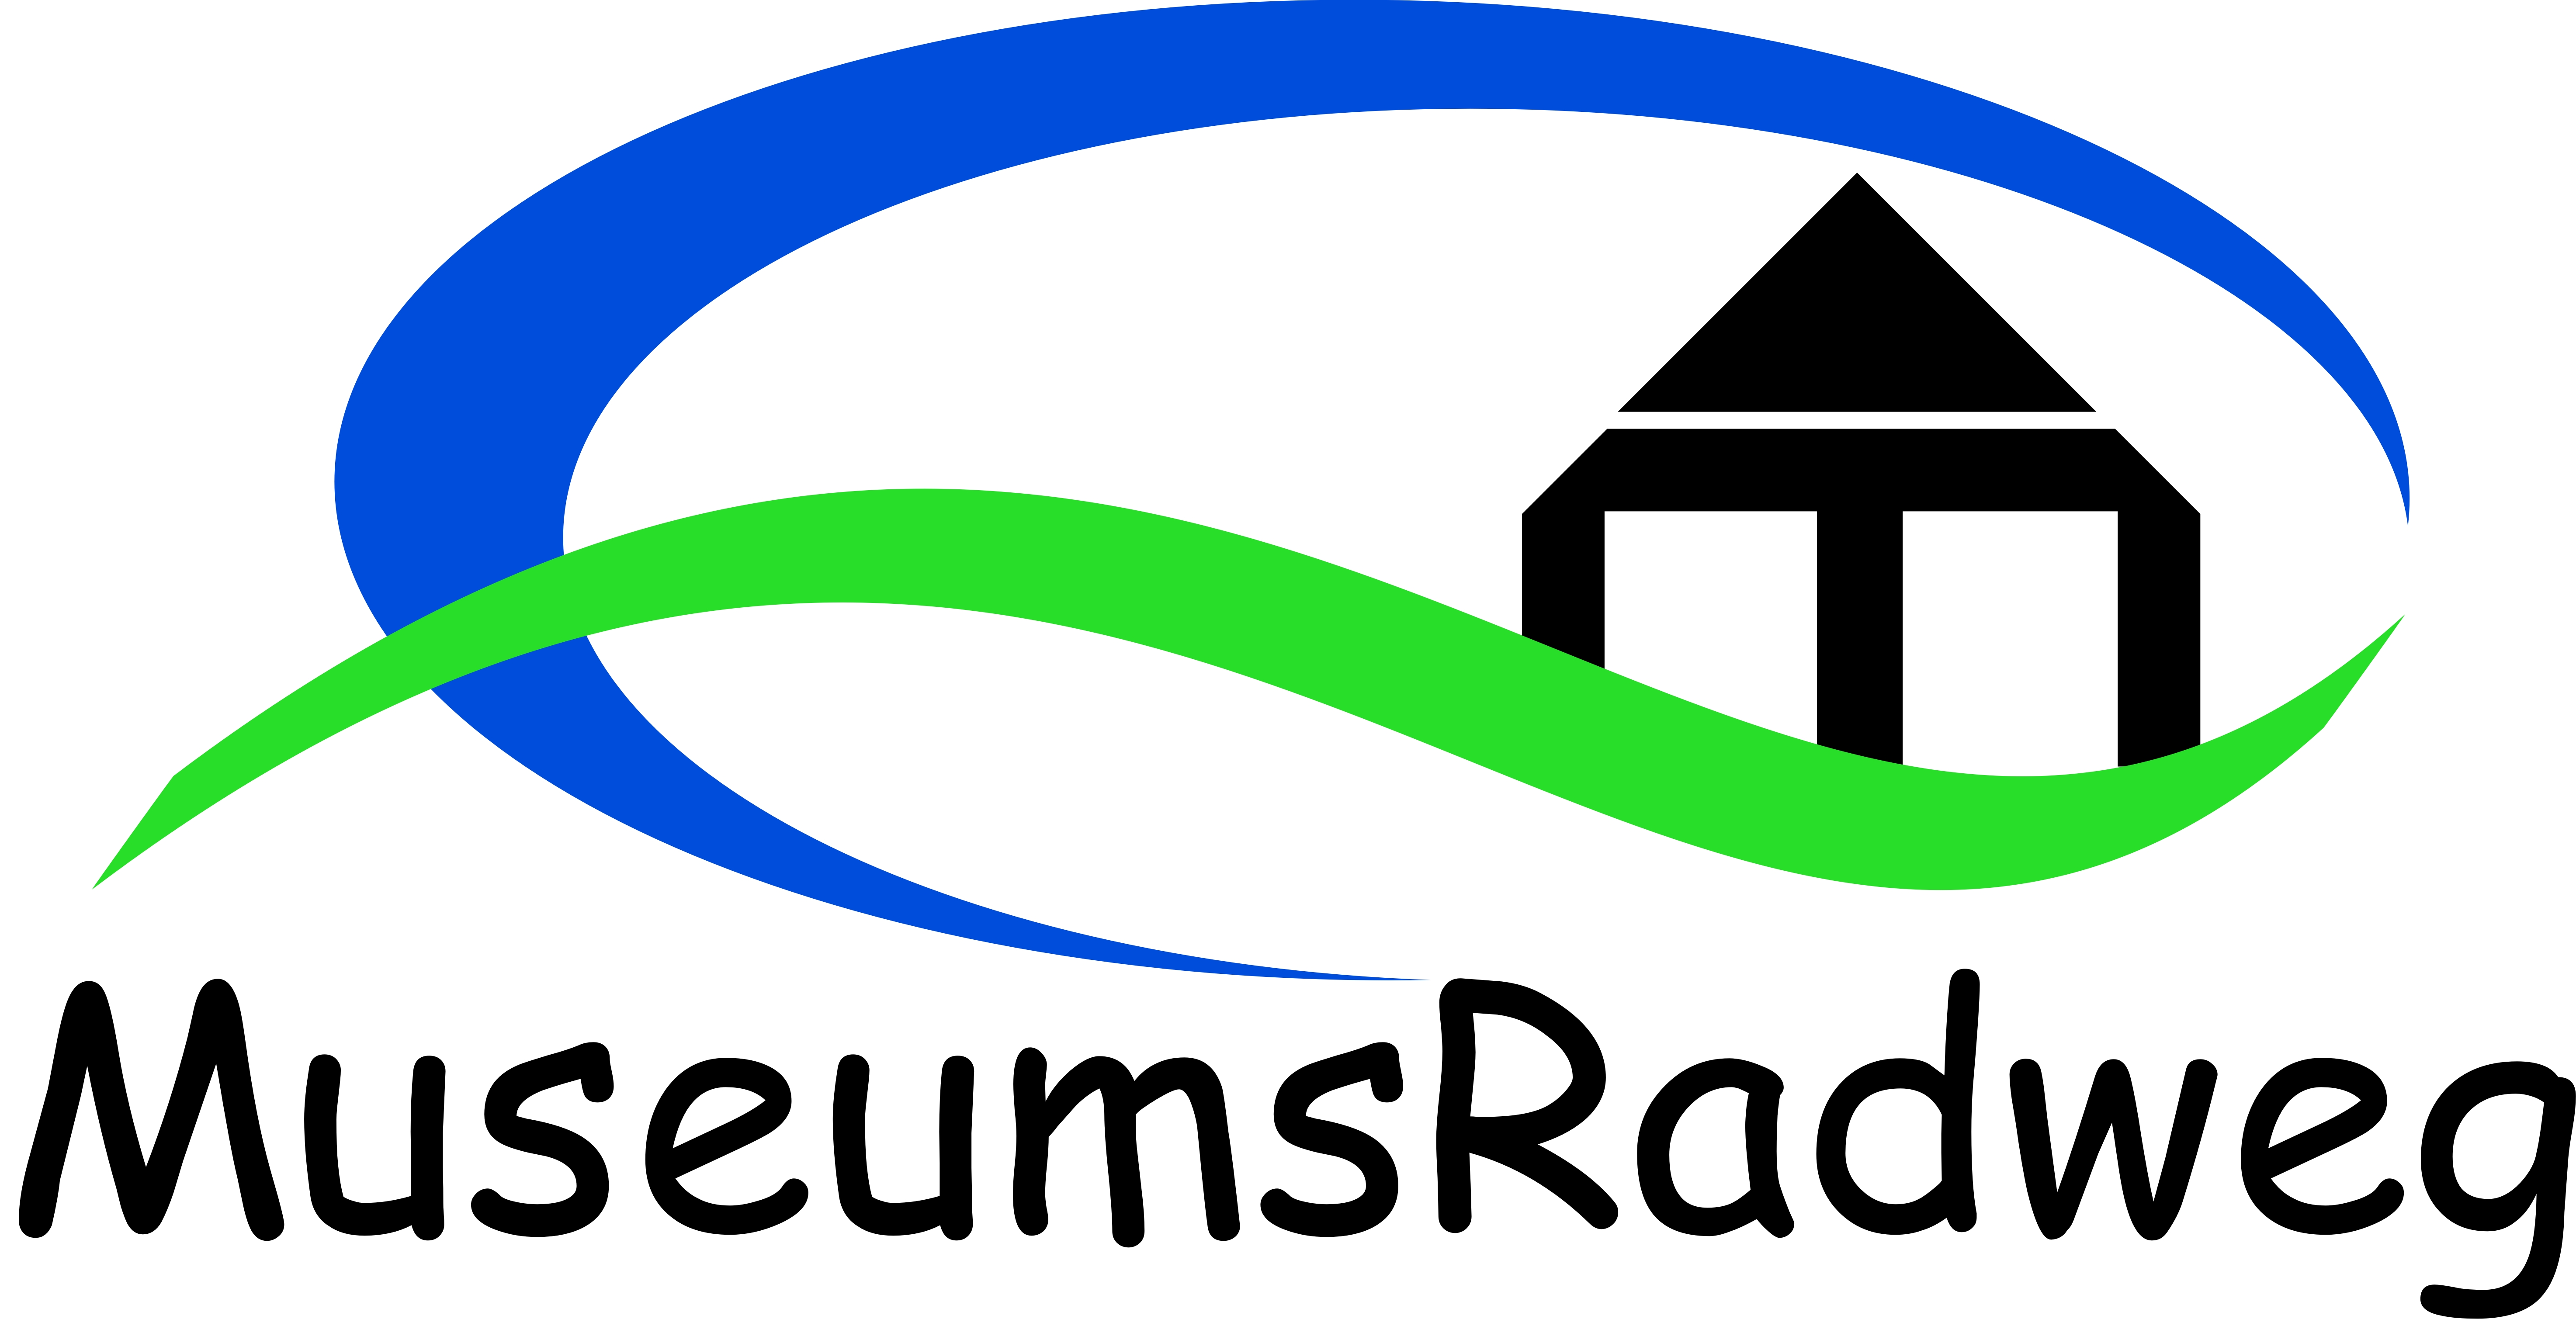 Museumsradweg Logo